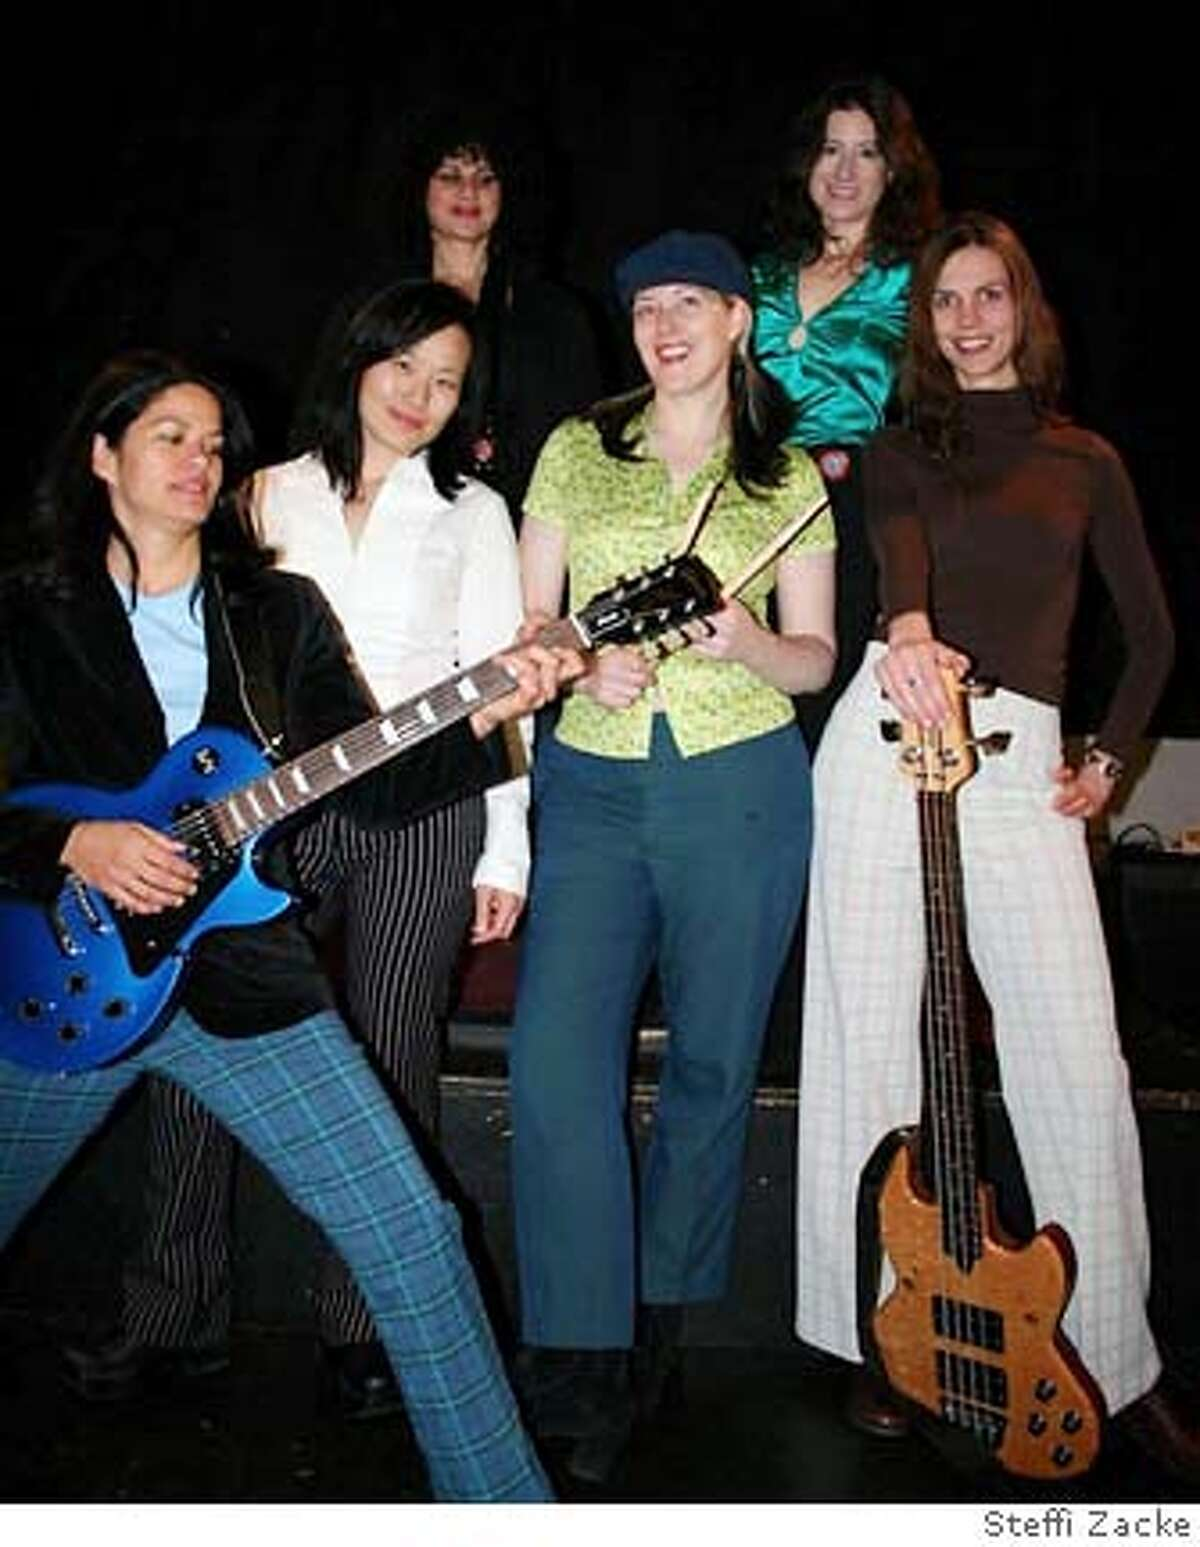 Band is called the Minks. Photo credit: Steffi ZackeRan on: 03-23-2006 From left, Pia DeSouza, Aileen Yoo, Nancy Magnelli, Marie Drennan, Jennifer Michalski, Freia Spillman.Ran on: 03-23-2006 From left, Pia DeSouza, Aileen Yoo, Nancy Magnelli, Marie Drennan, Jennifer Michalski, Freia Spillman.Ran on: 03-23-2006 From left, Pia DeSouza, Aileen Yoo, Nancy Magnelli, Marie Drennan, Jennifer Michalski, Freia Spillman.